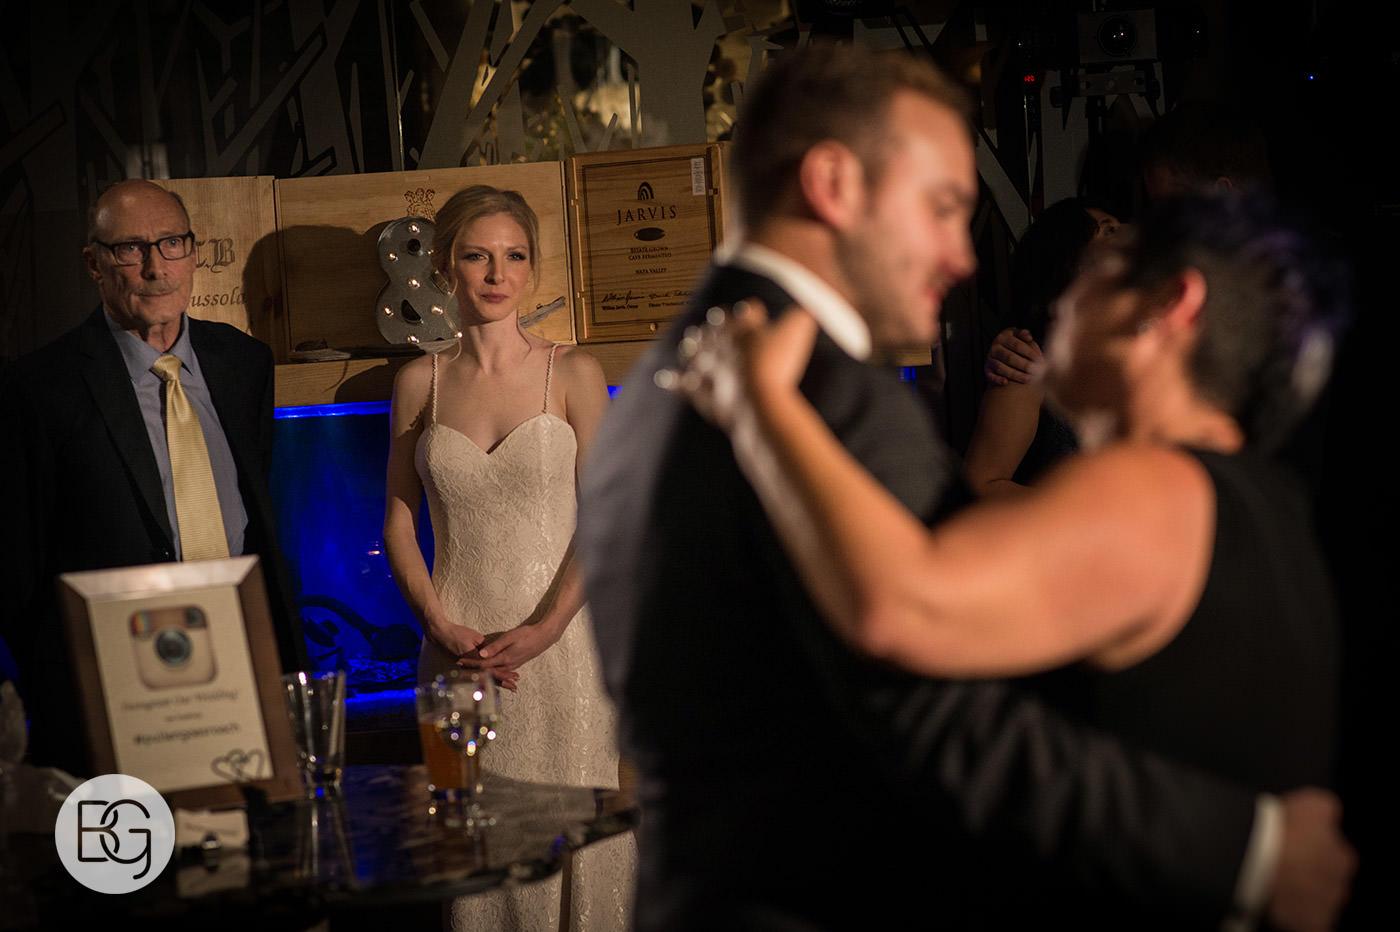 Edmonton_wedding_photographers_josh_sara_whyte_47.jpg